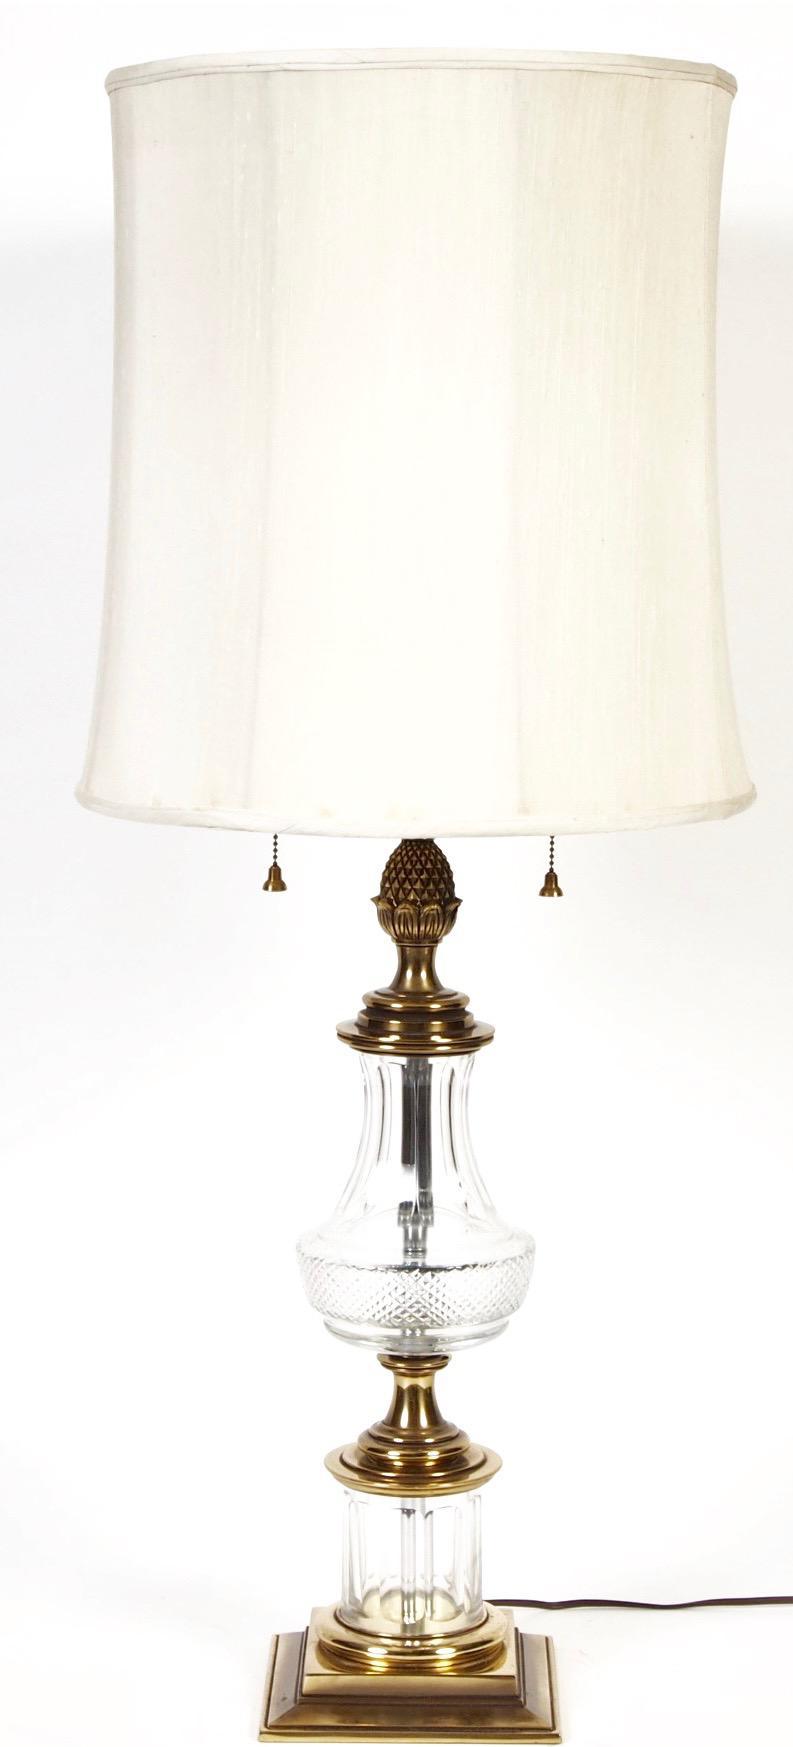 Stiffel Cut Crystal U0026 Brass Table Lamp   Image 2 ...